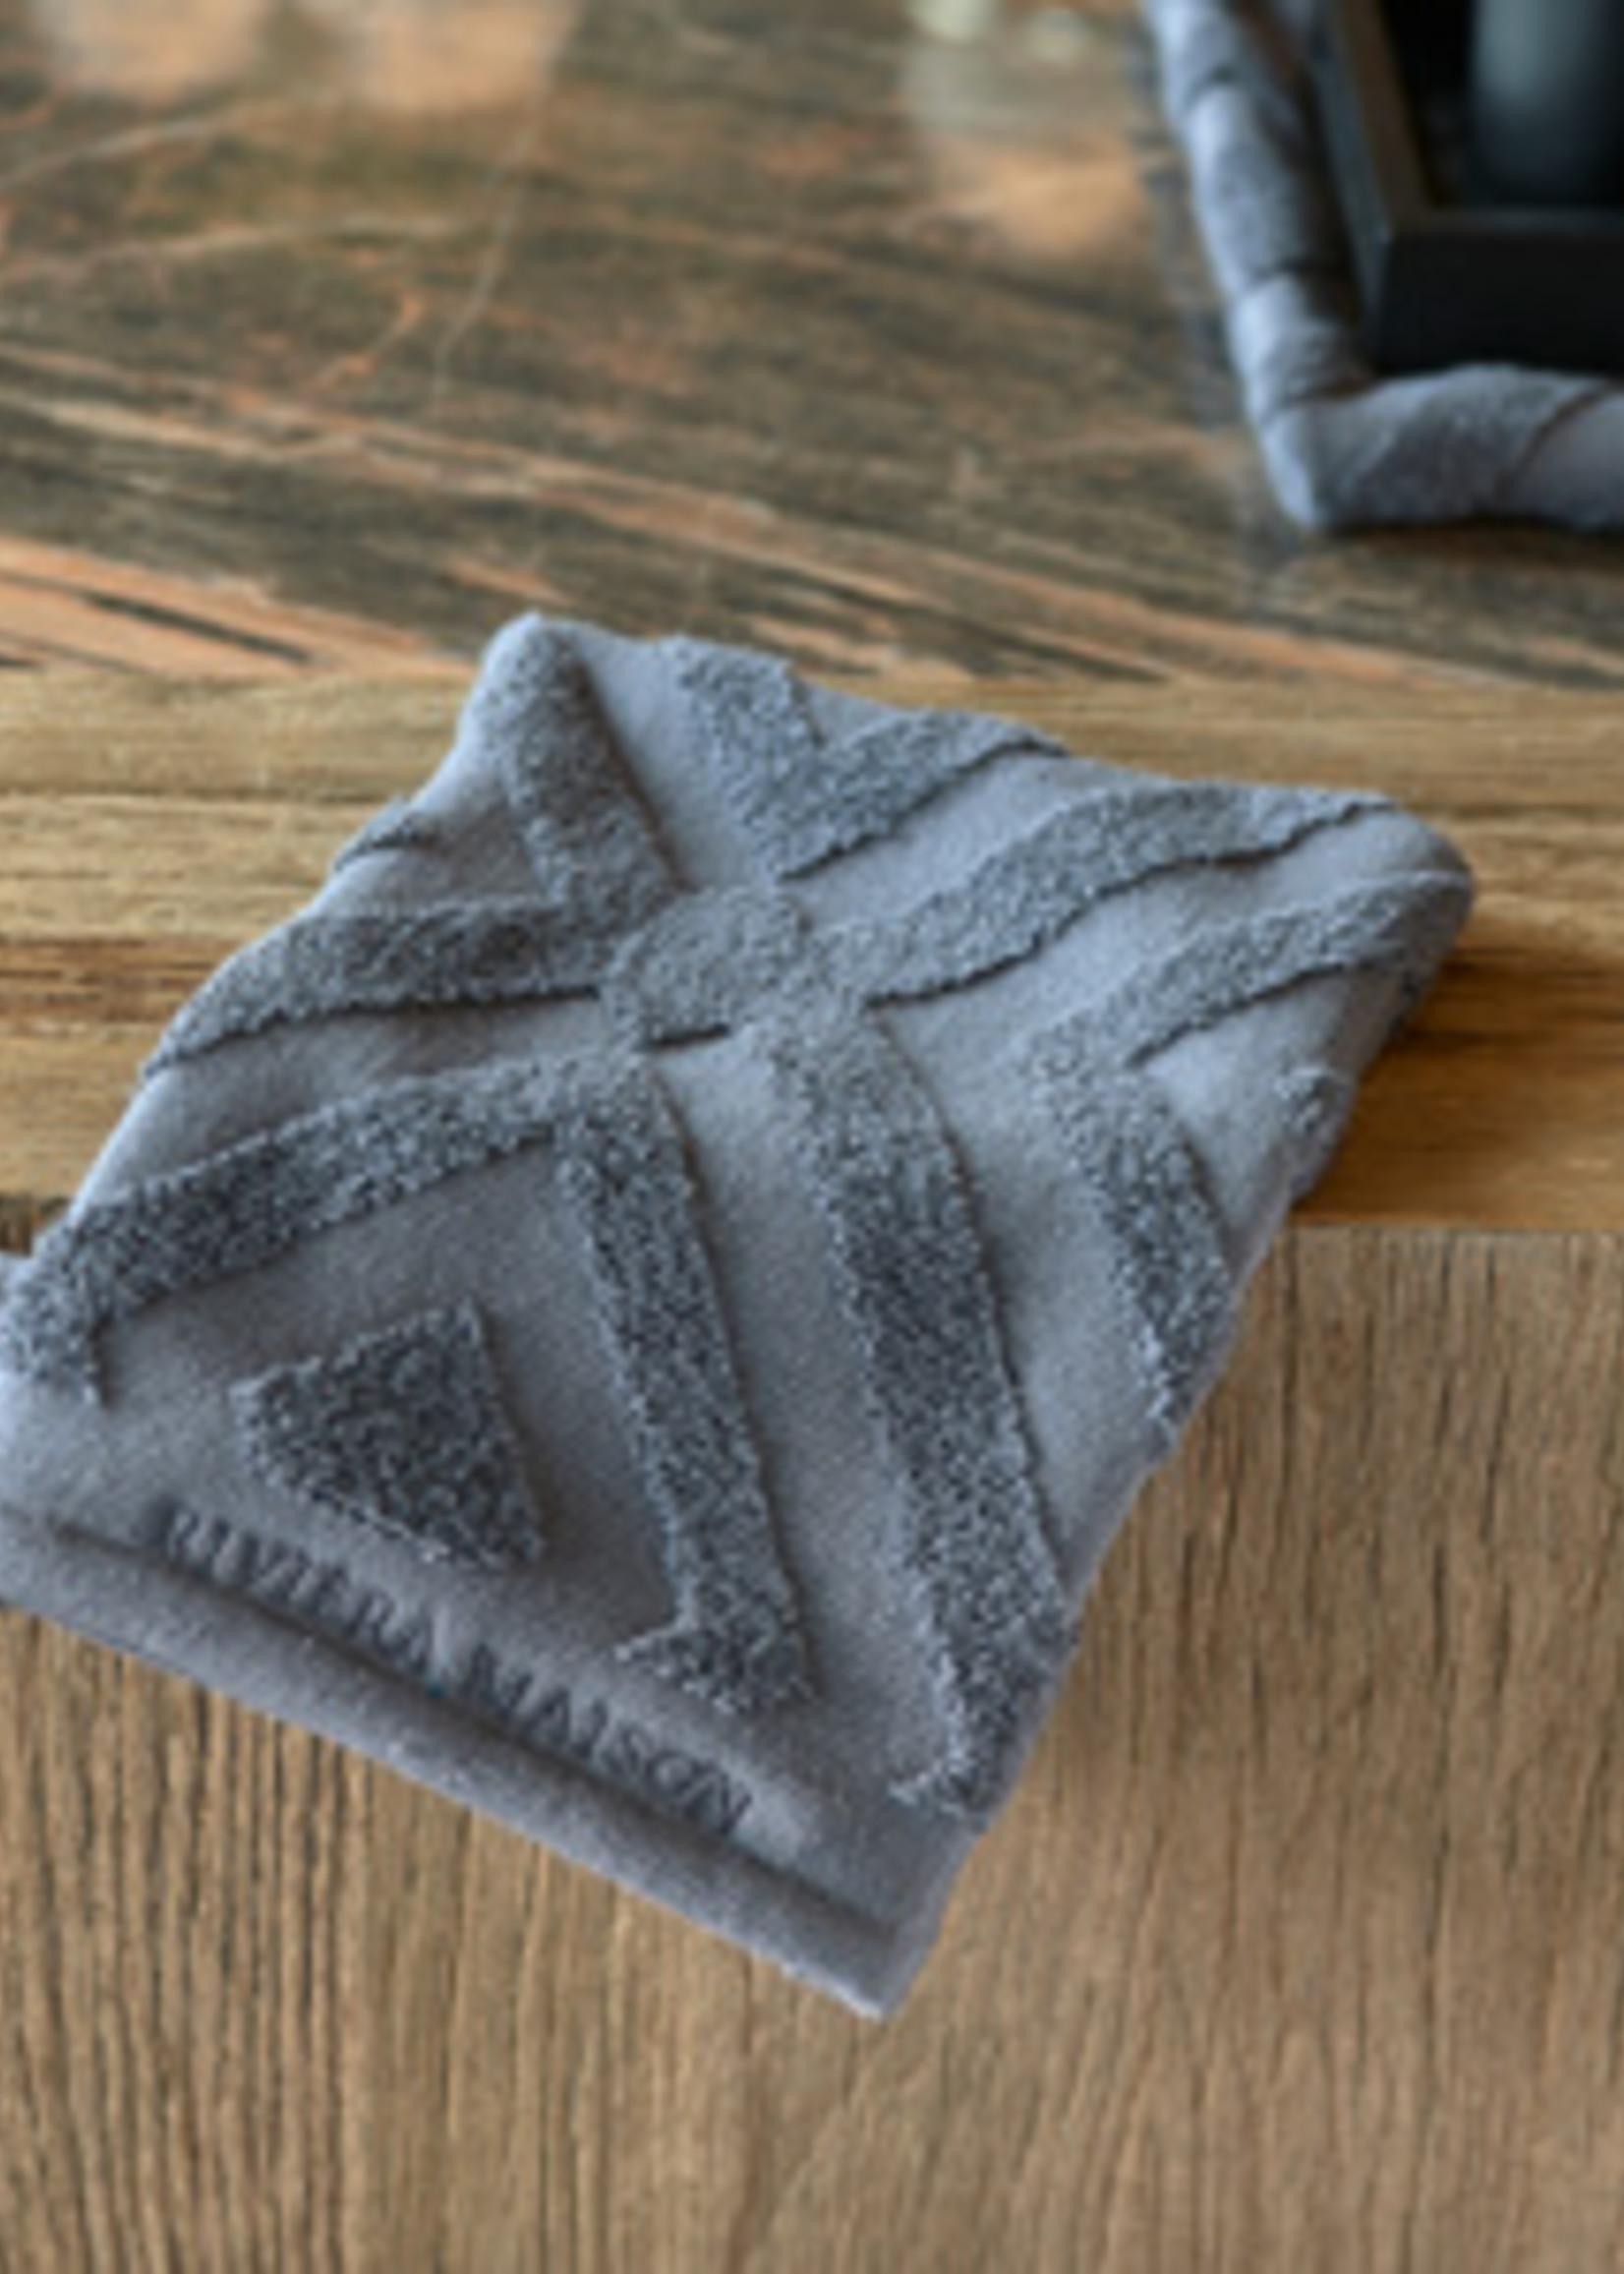 Riviera Maison RM Chic Wash Cloth anthracite